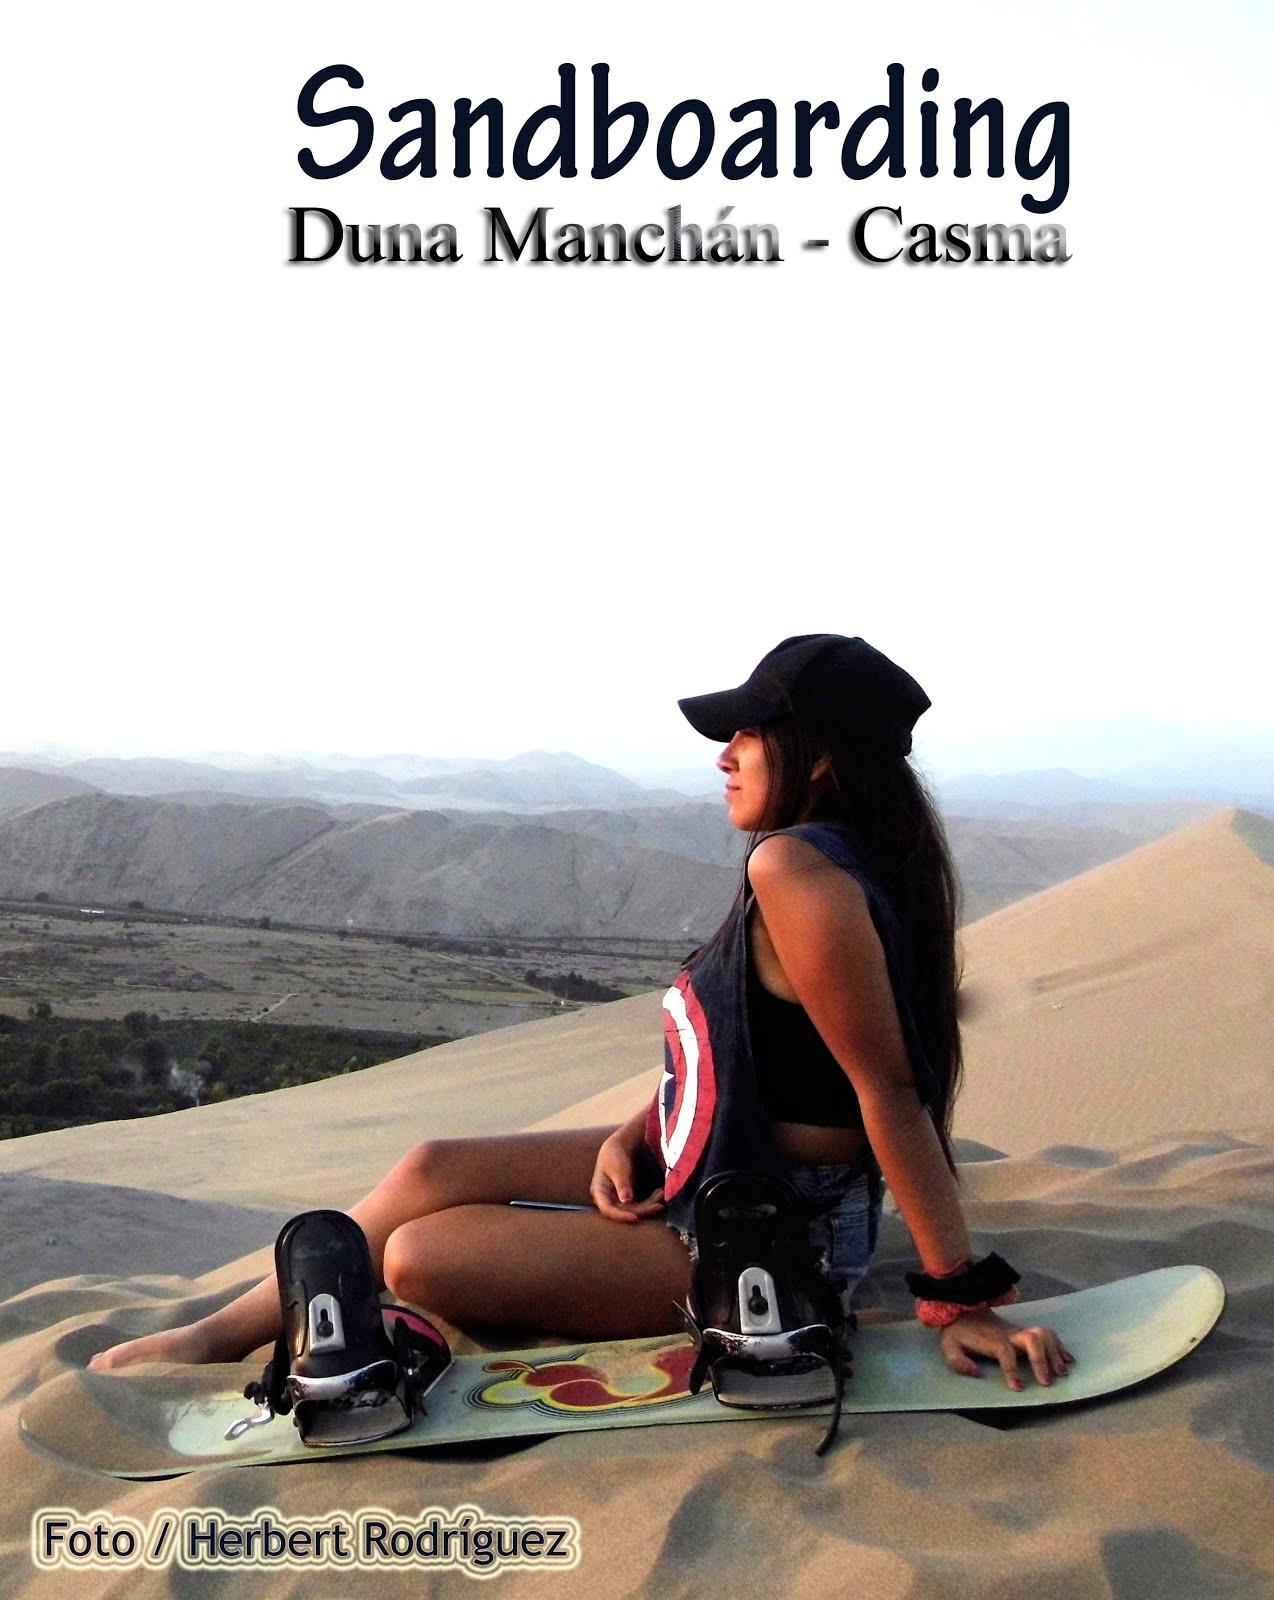 Sandboarding en la Duna Manchán